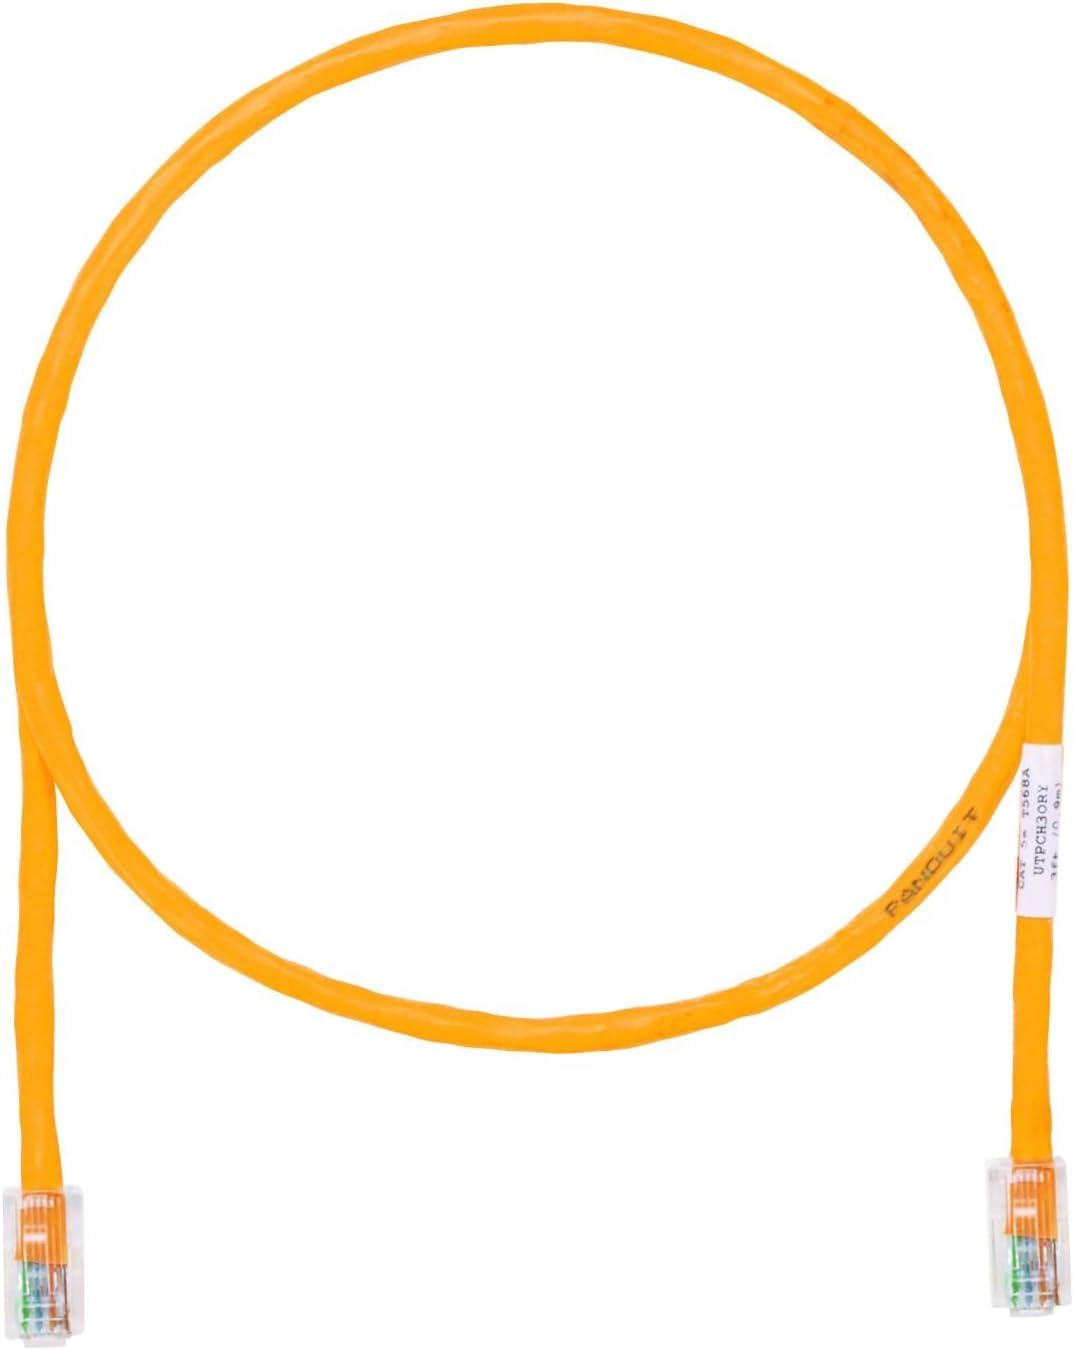 pandouitto LAN Cable Cat5e Professional 6/m Orange utpch6mory